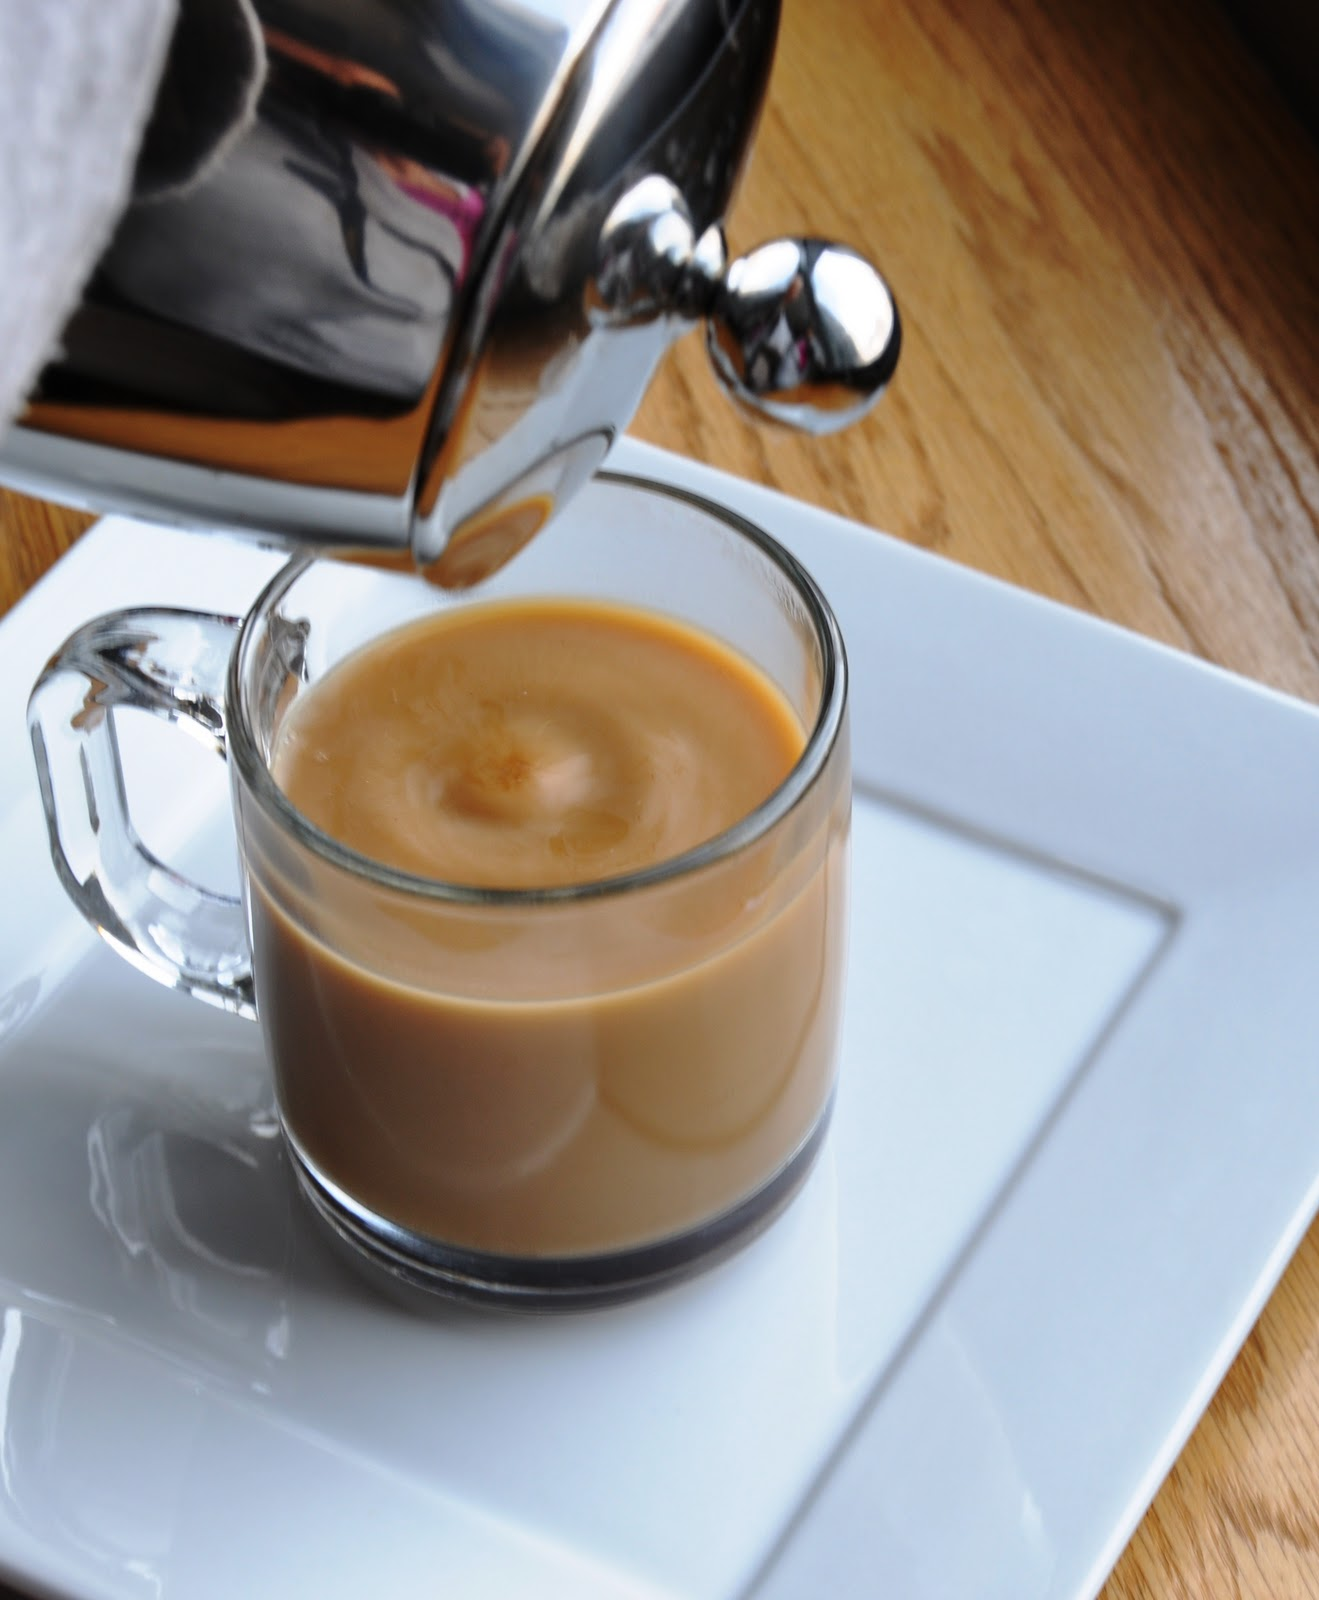 Best Way To Make Coffee Taste Good